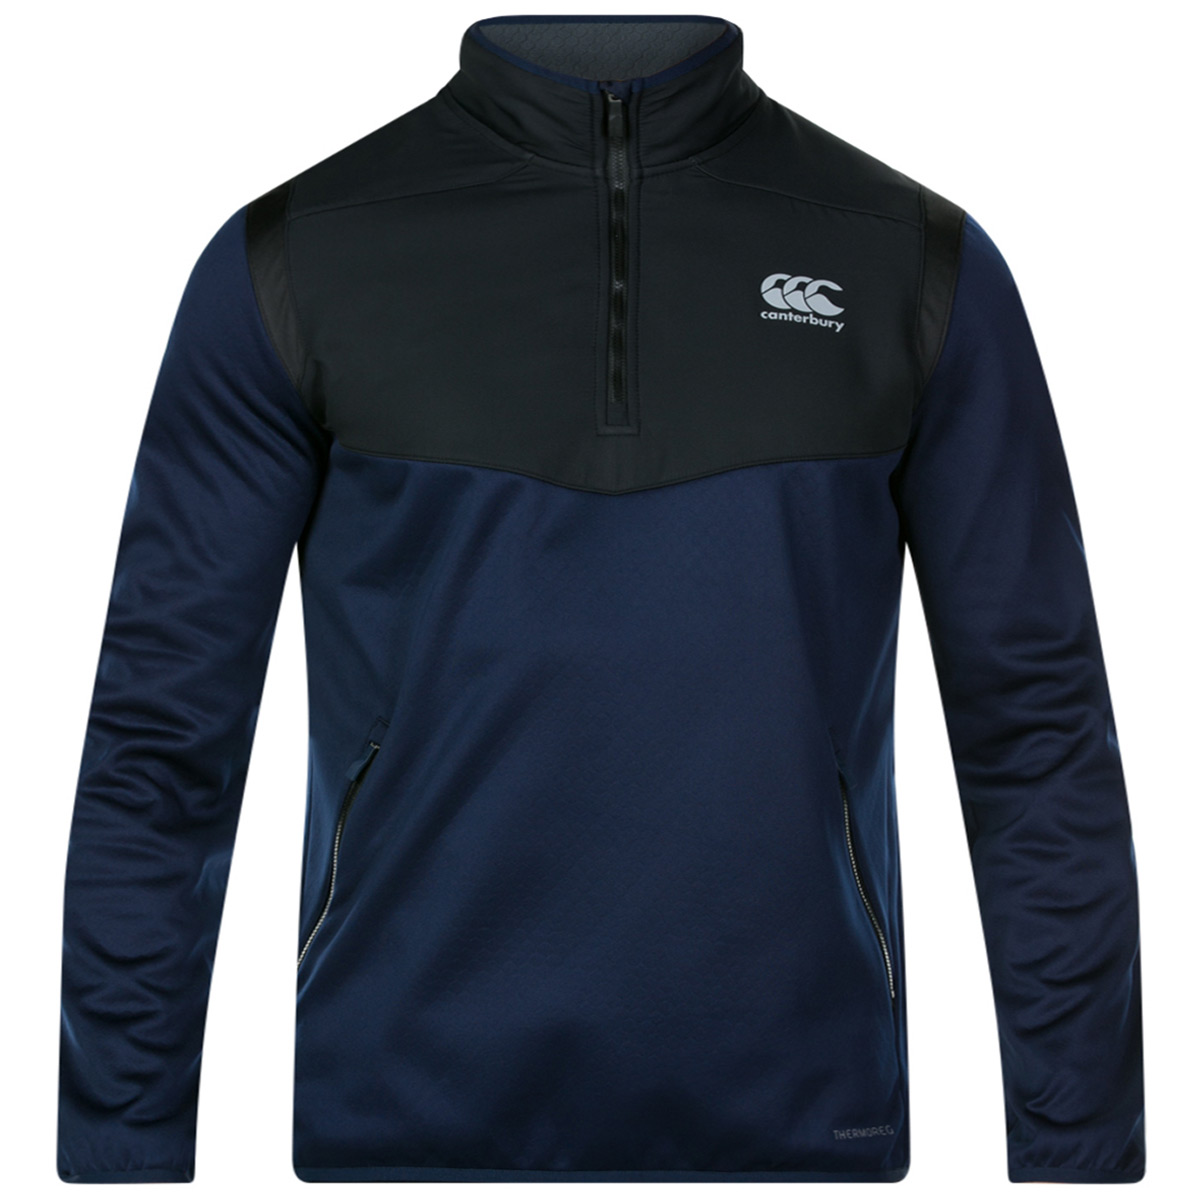 Canterbury Mens Thermoreg 1//4 Zip Running Fleece Sweater Top 29/% OFF RRP